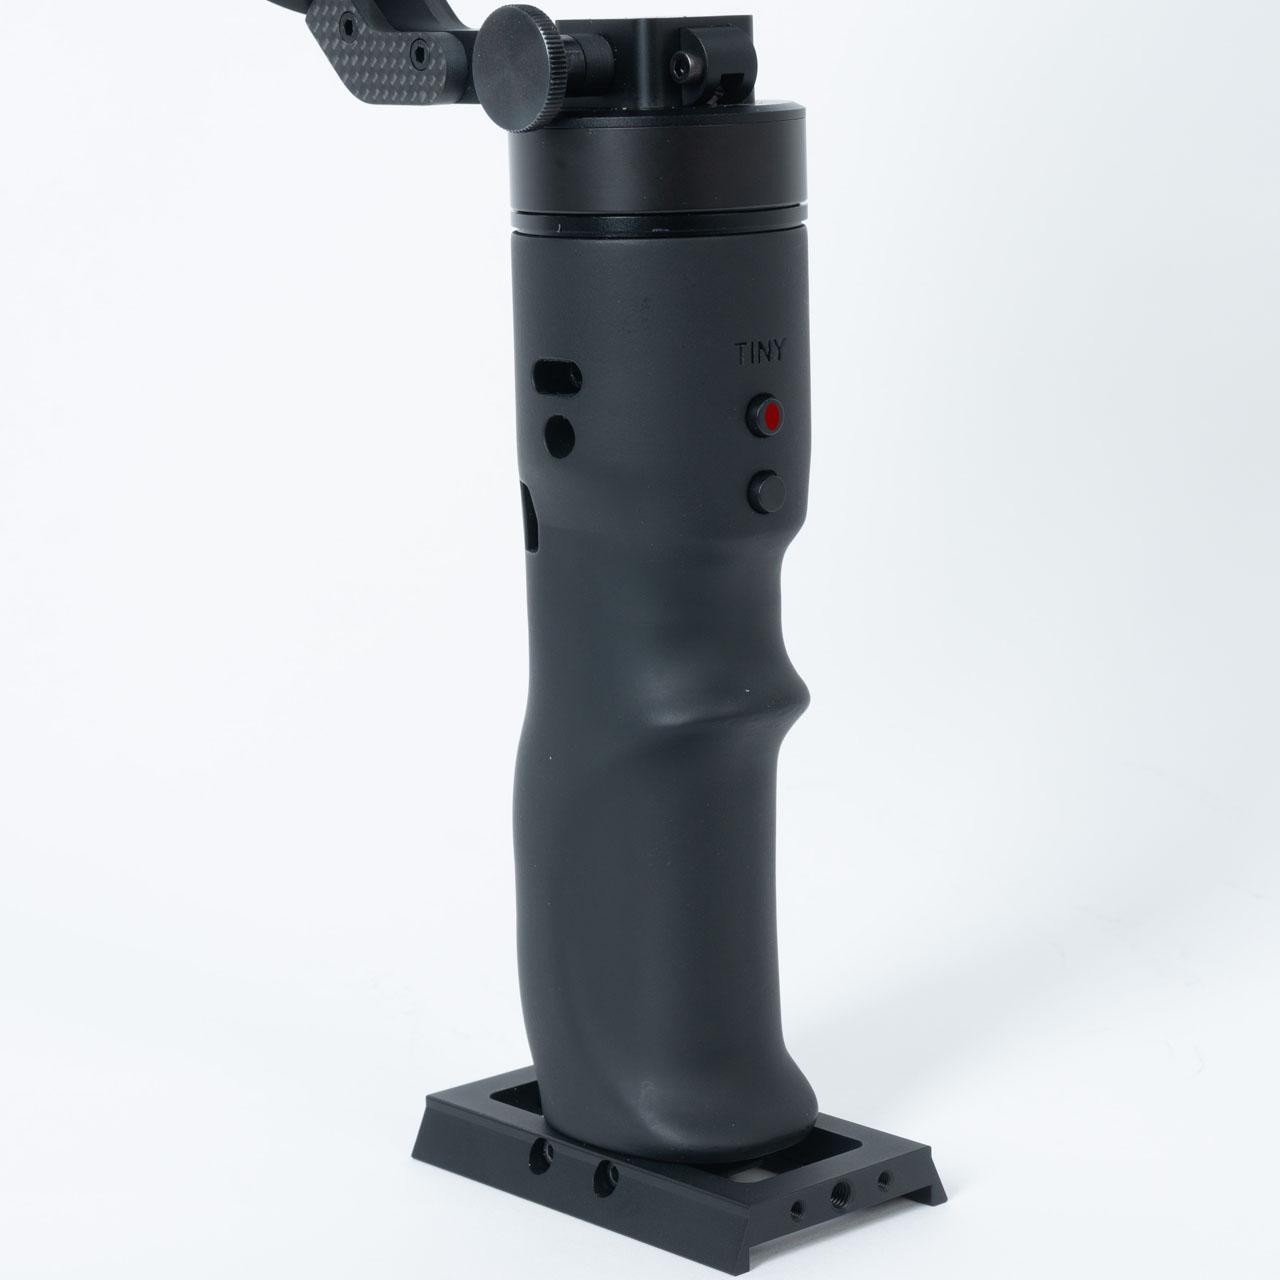 icecam gimbal tiny 3 ultravision manico ergonomico new